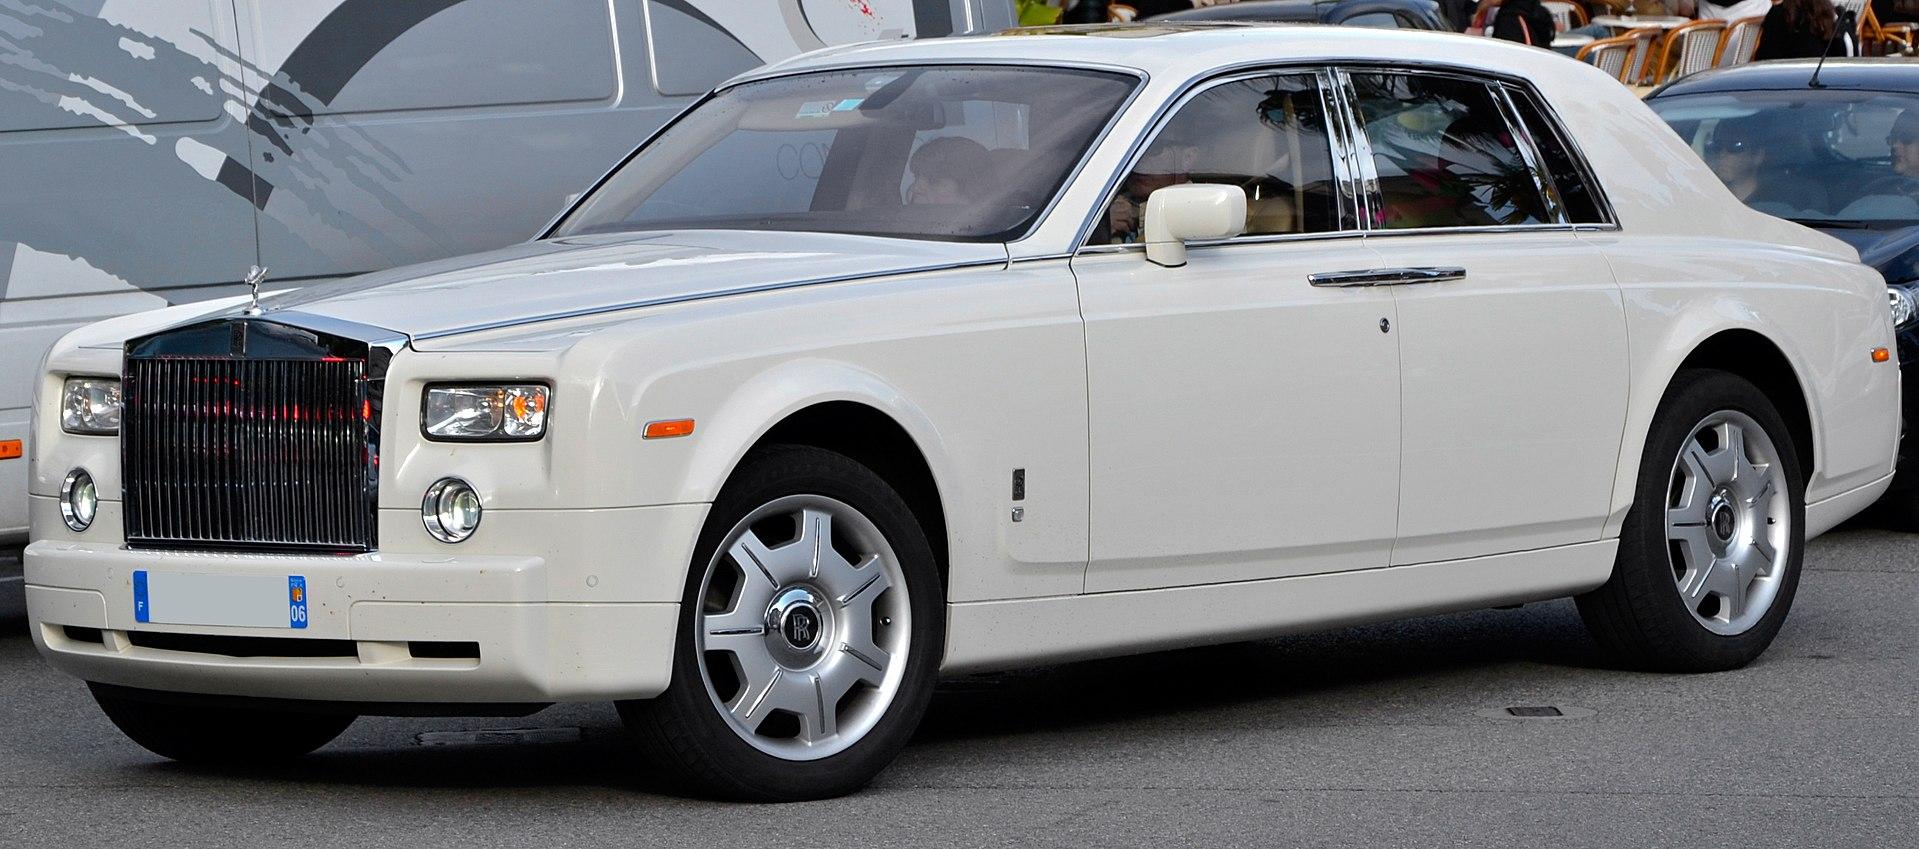 2008 Drophead Rolls Phantom Coupe Royce